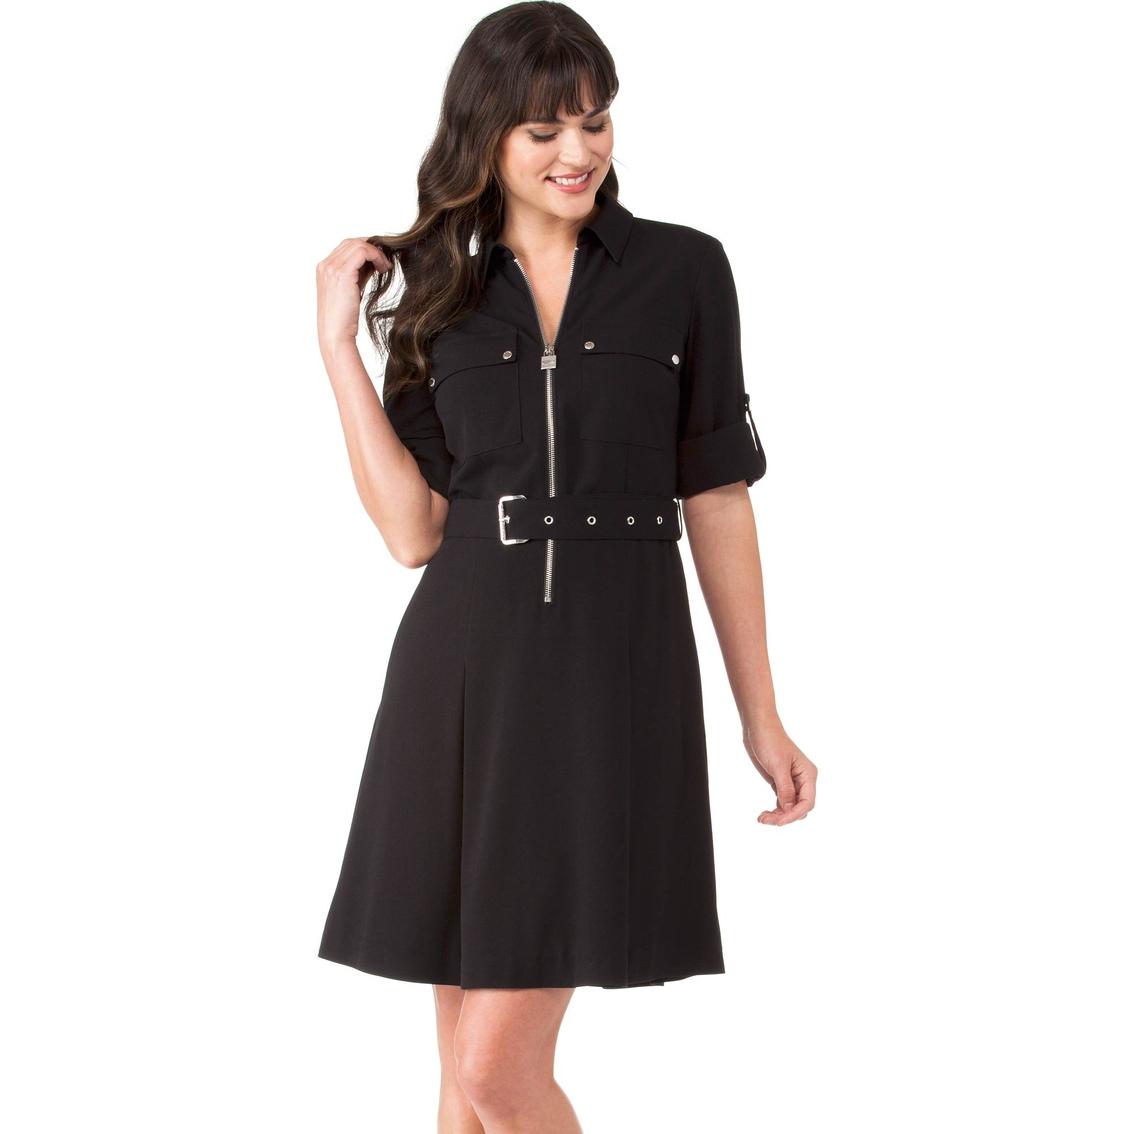 91c046632f2 Michael Kors Lock Zip Shirt Dress